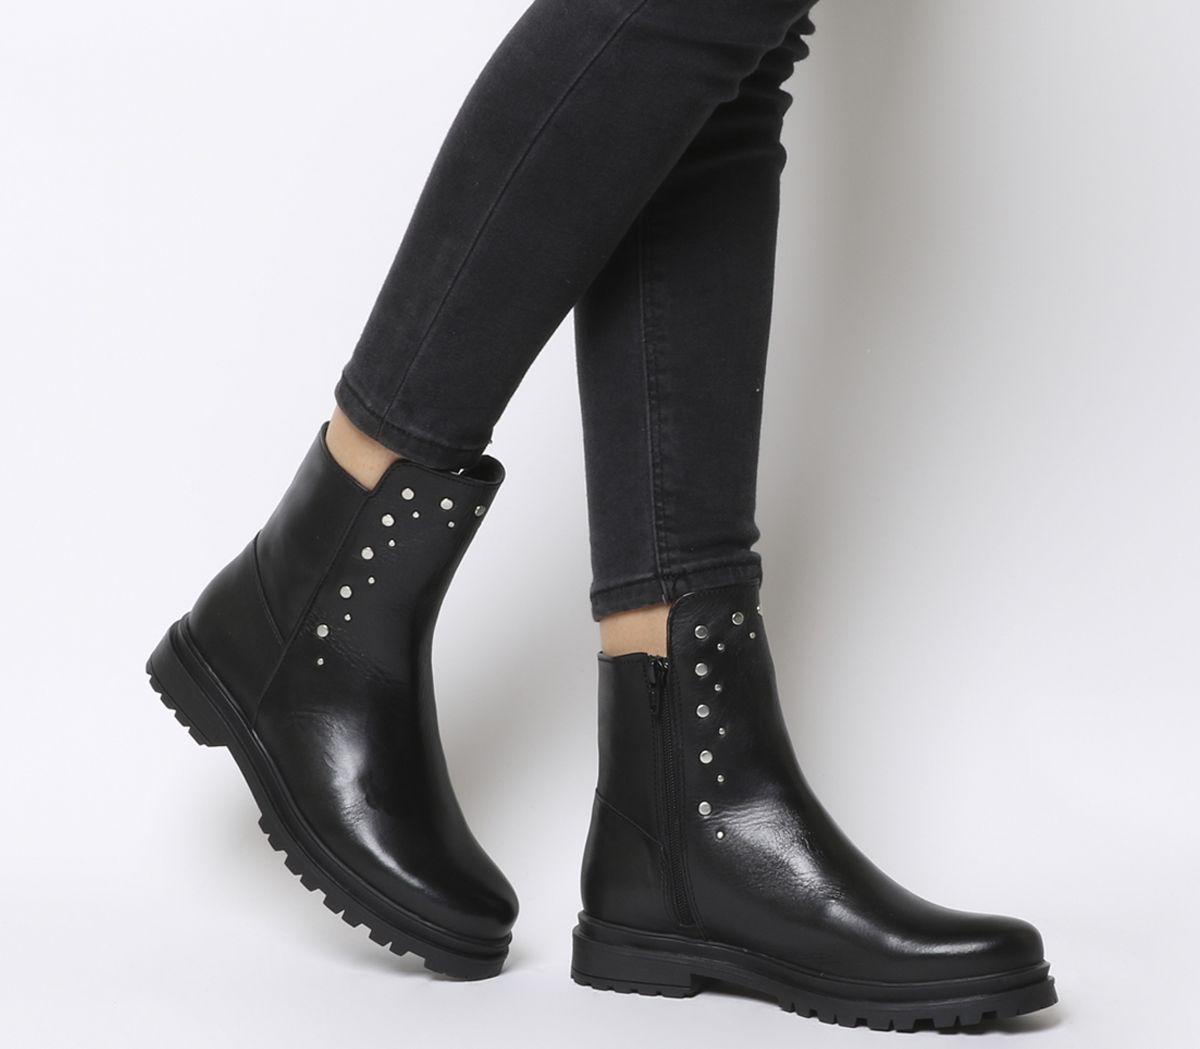 1f54efea535984 Shoe the Bear Akira Stud Boots Black - Ankle Boots